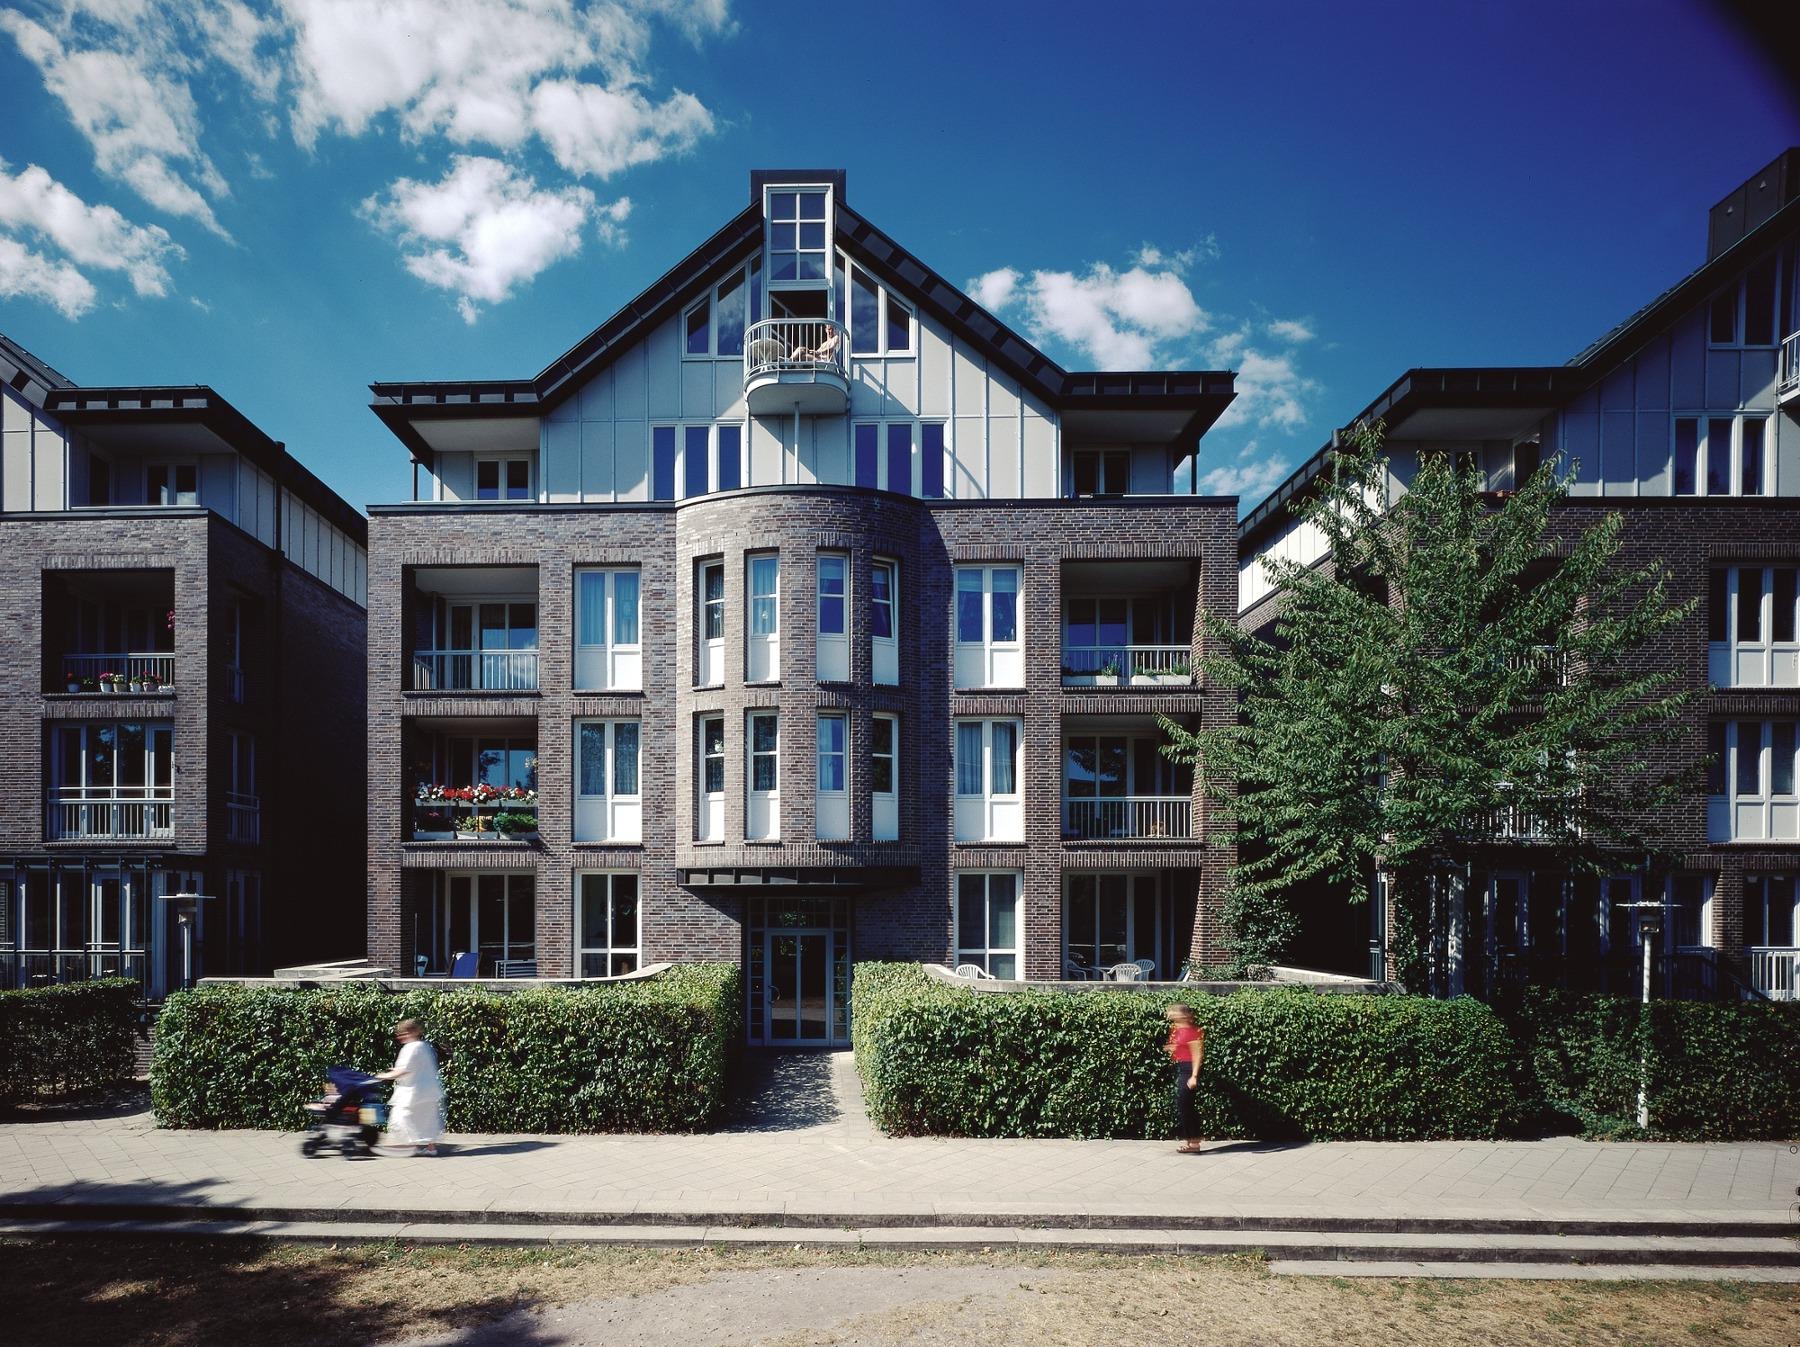 Wohnbebauung Winterhuder Fährhaus Hamburg